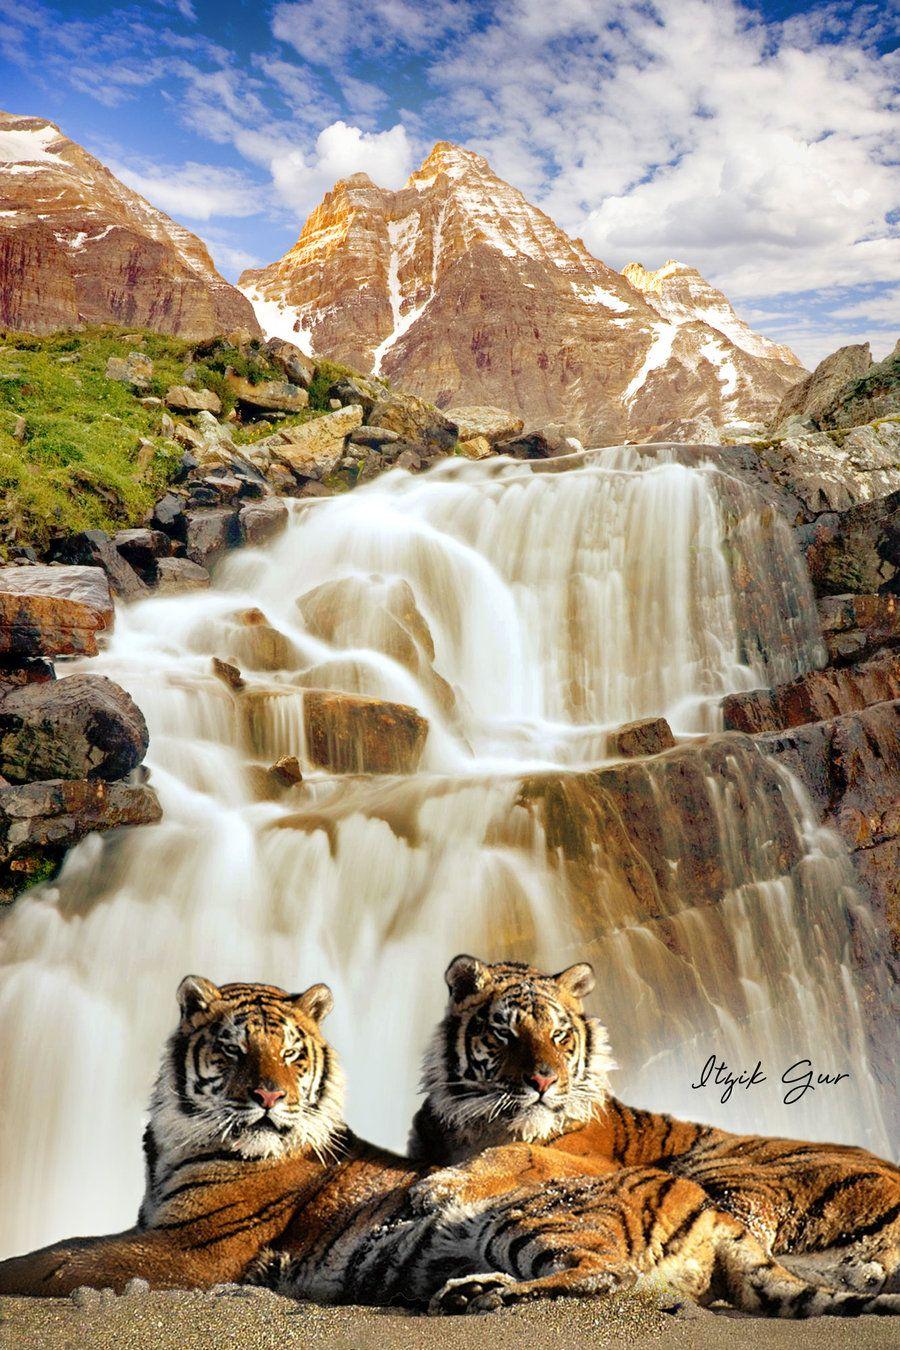 pair tigers lying in waterfallitzikgur on deviantart | tigers